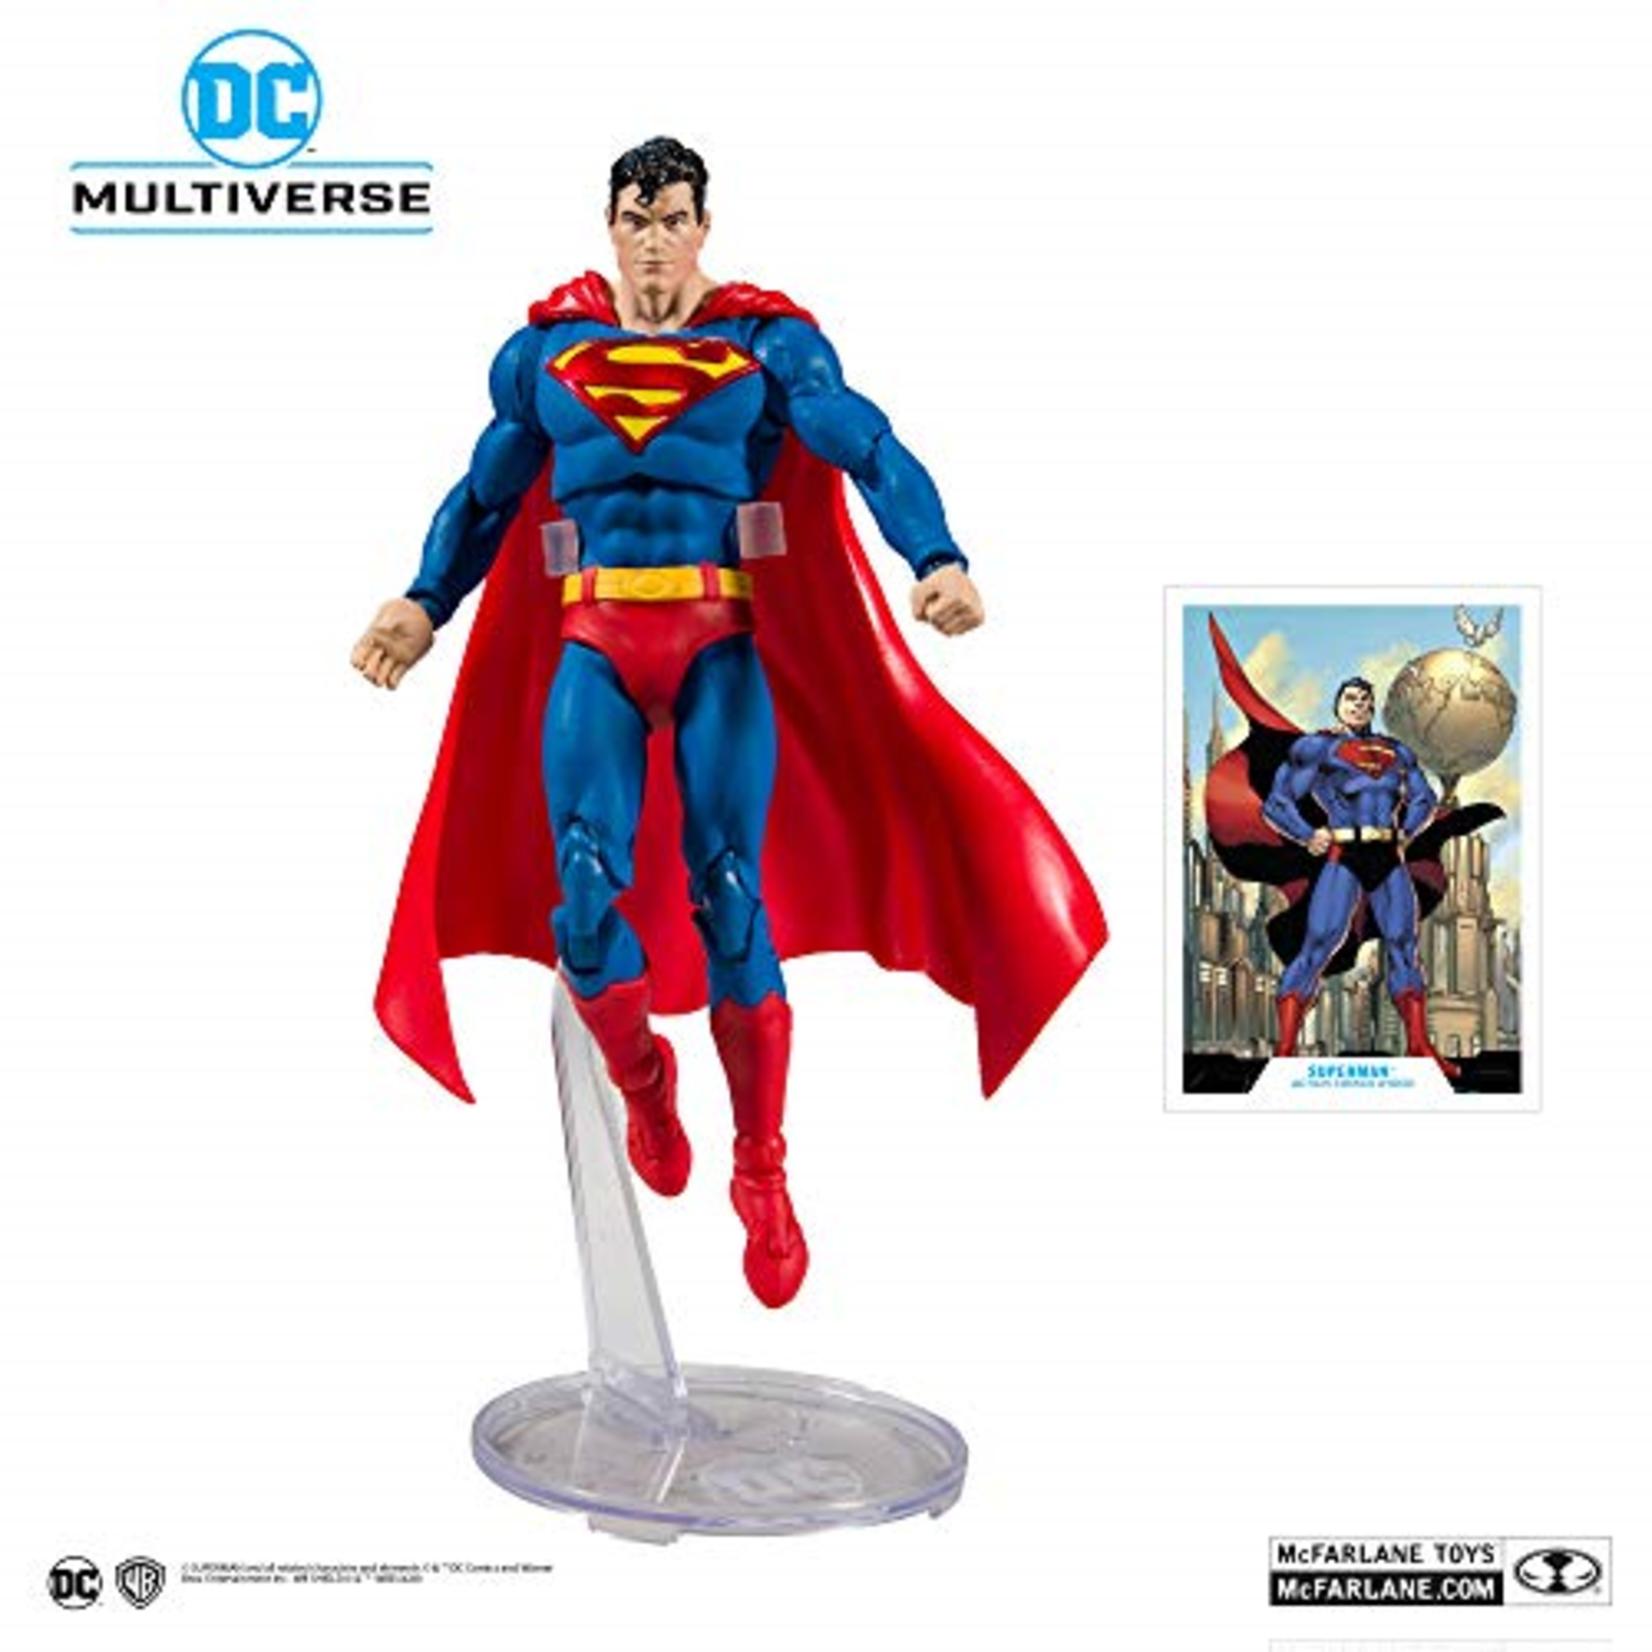 McFarlane Toys McFarlane Toys - DC Multiverse Superman Action Comics #1000